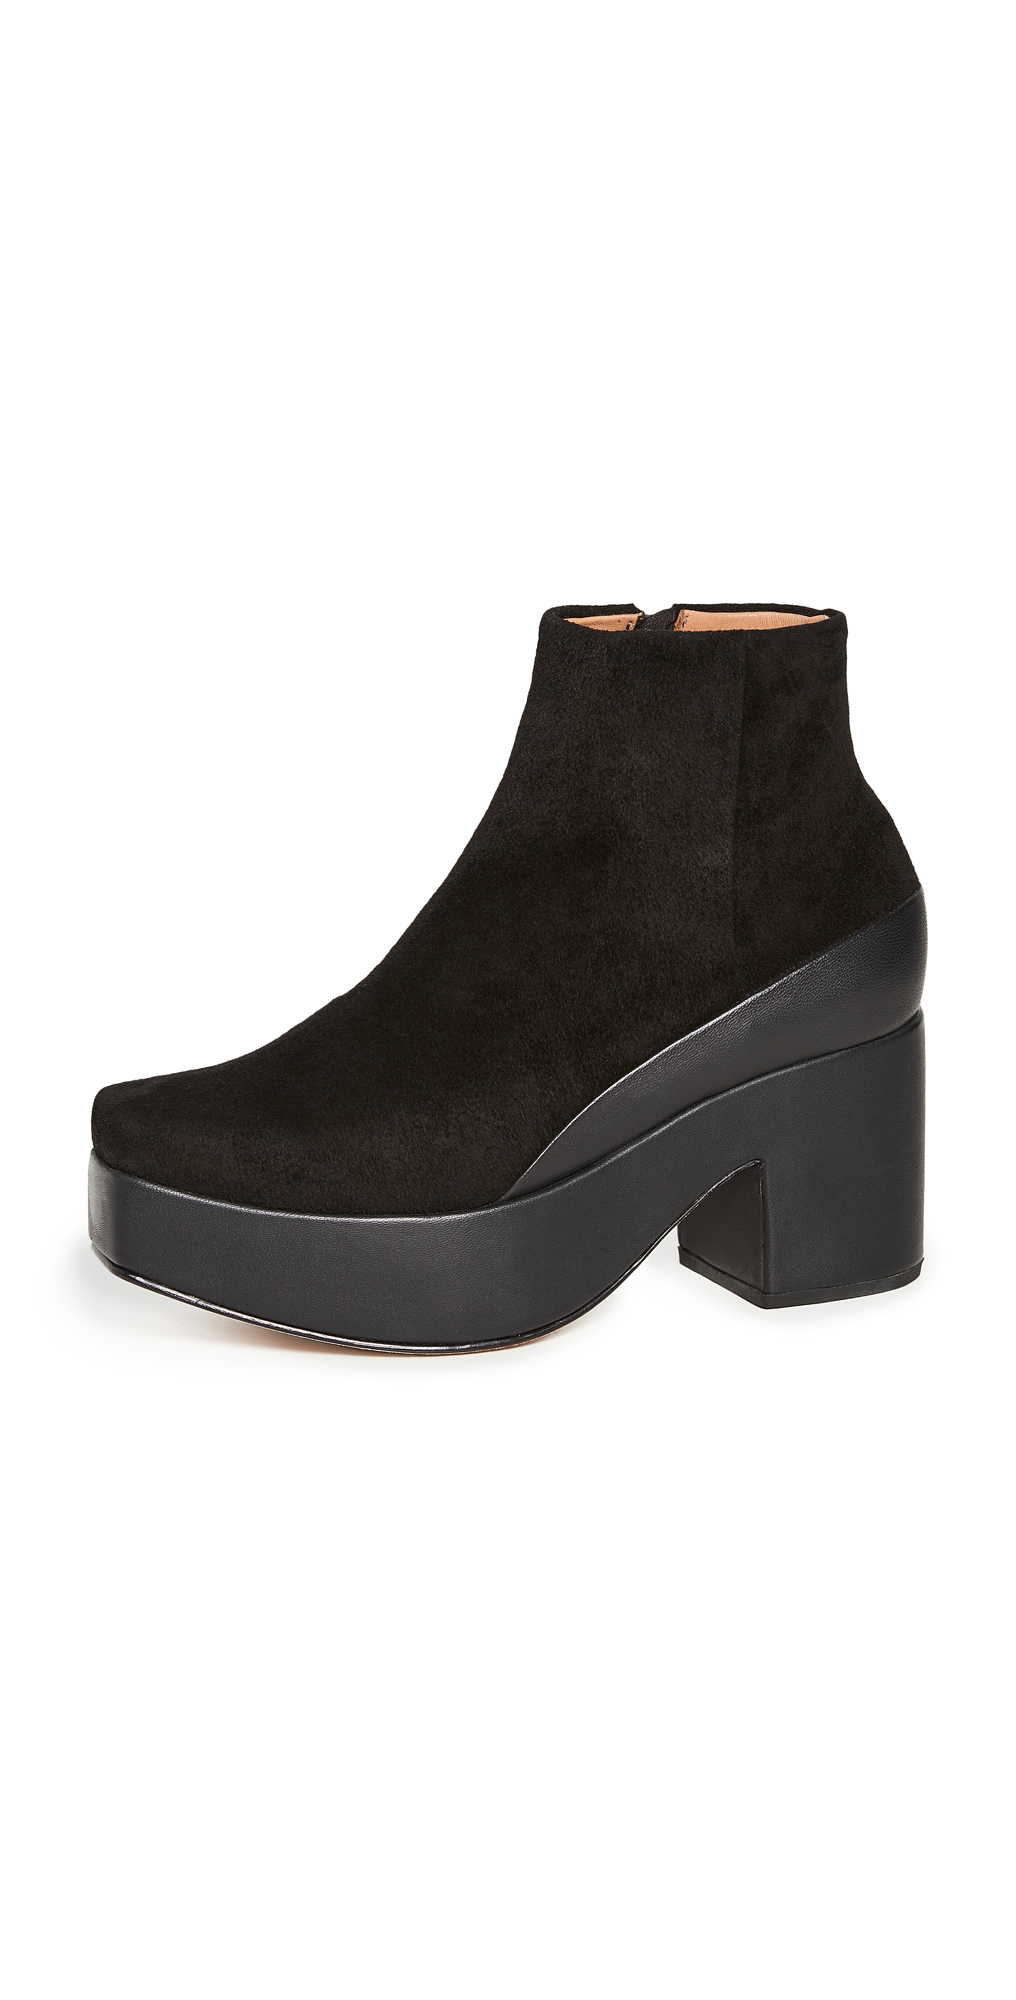 Rachel Comey Azolla Boots